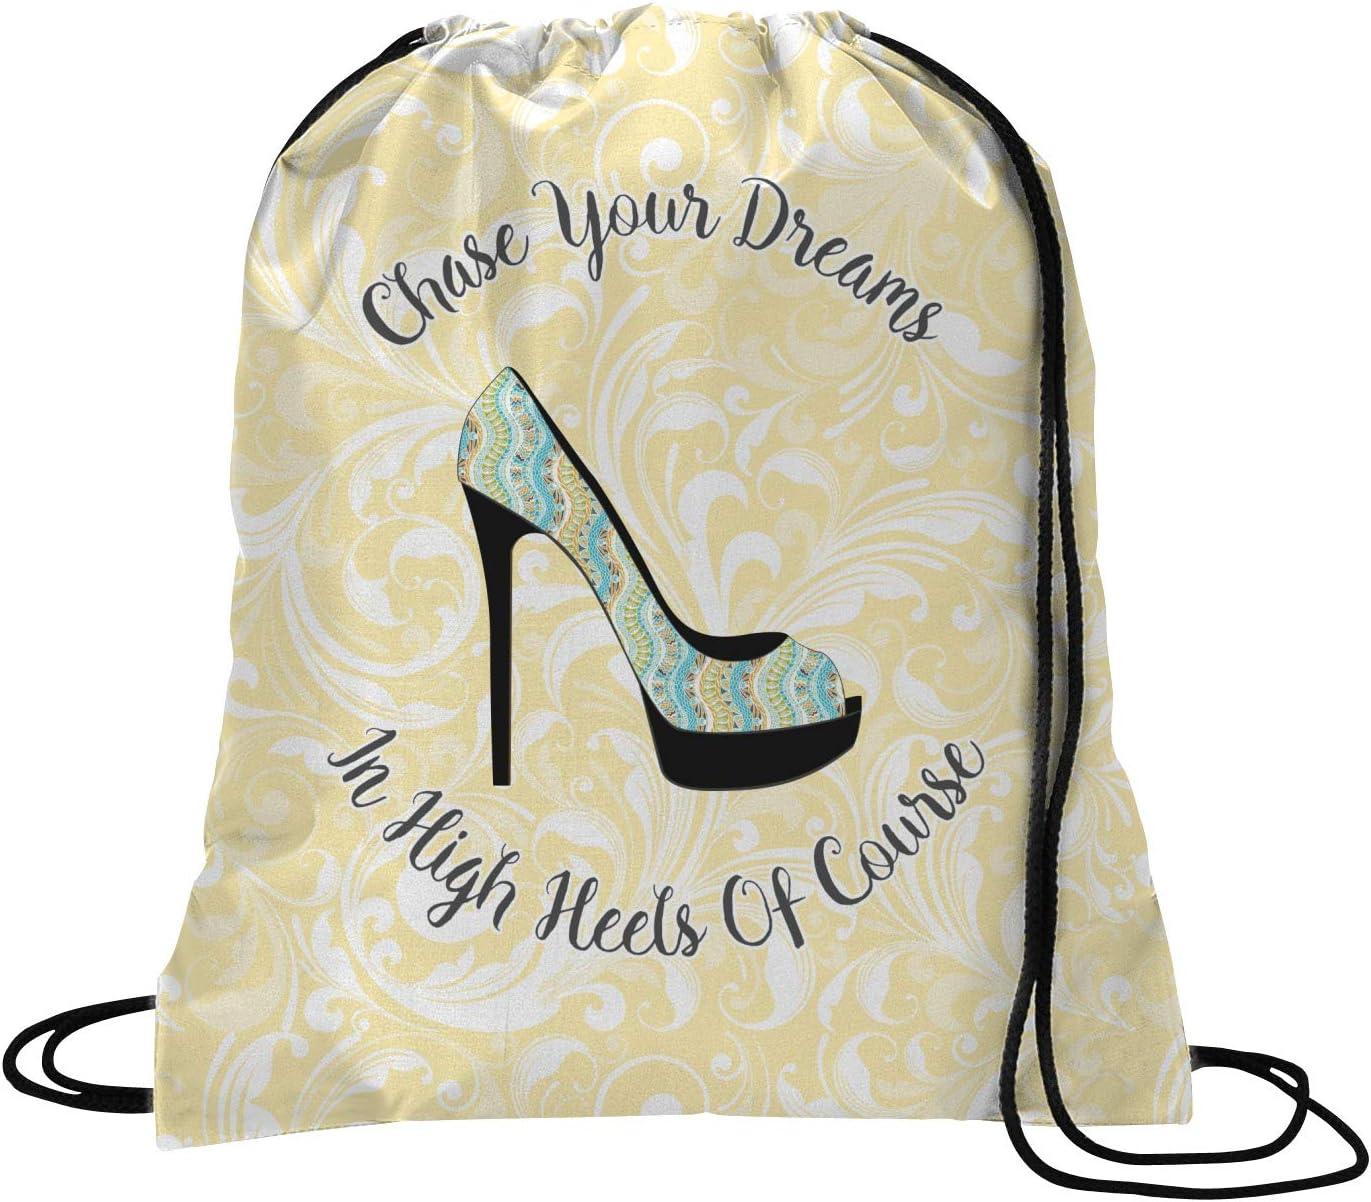 Drawstring Backpack High Heel Shoes Rucksack